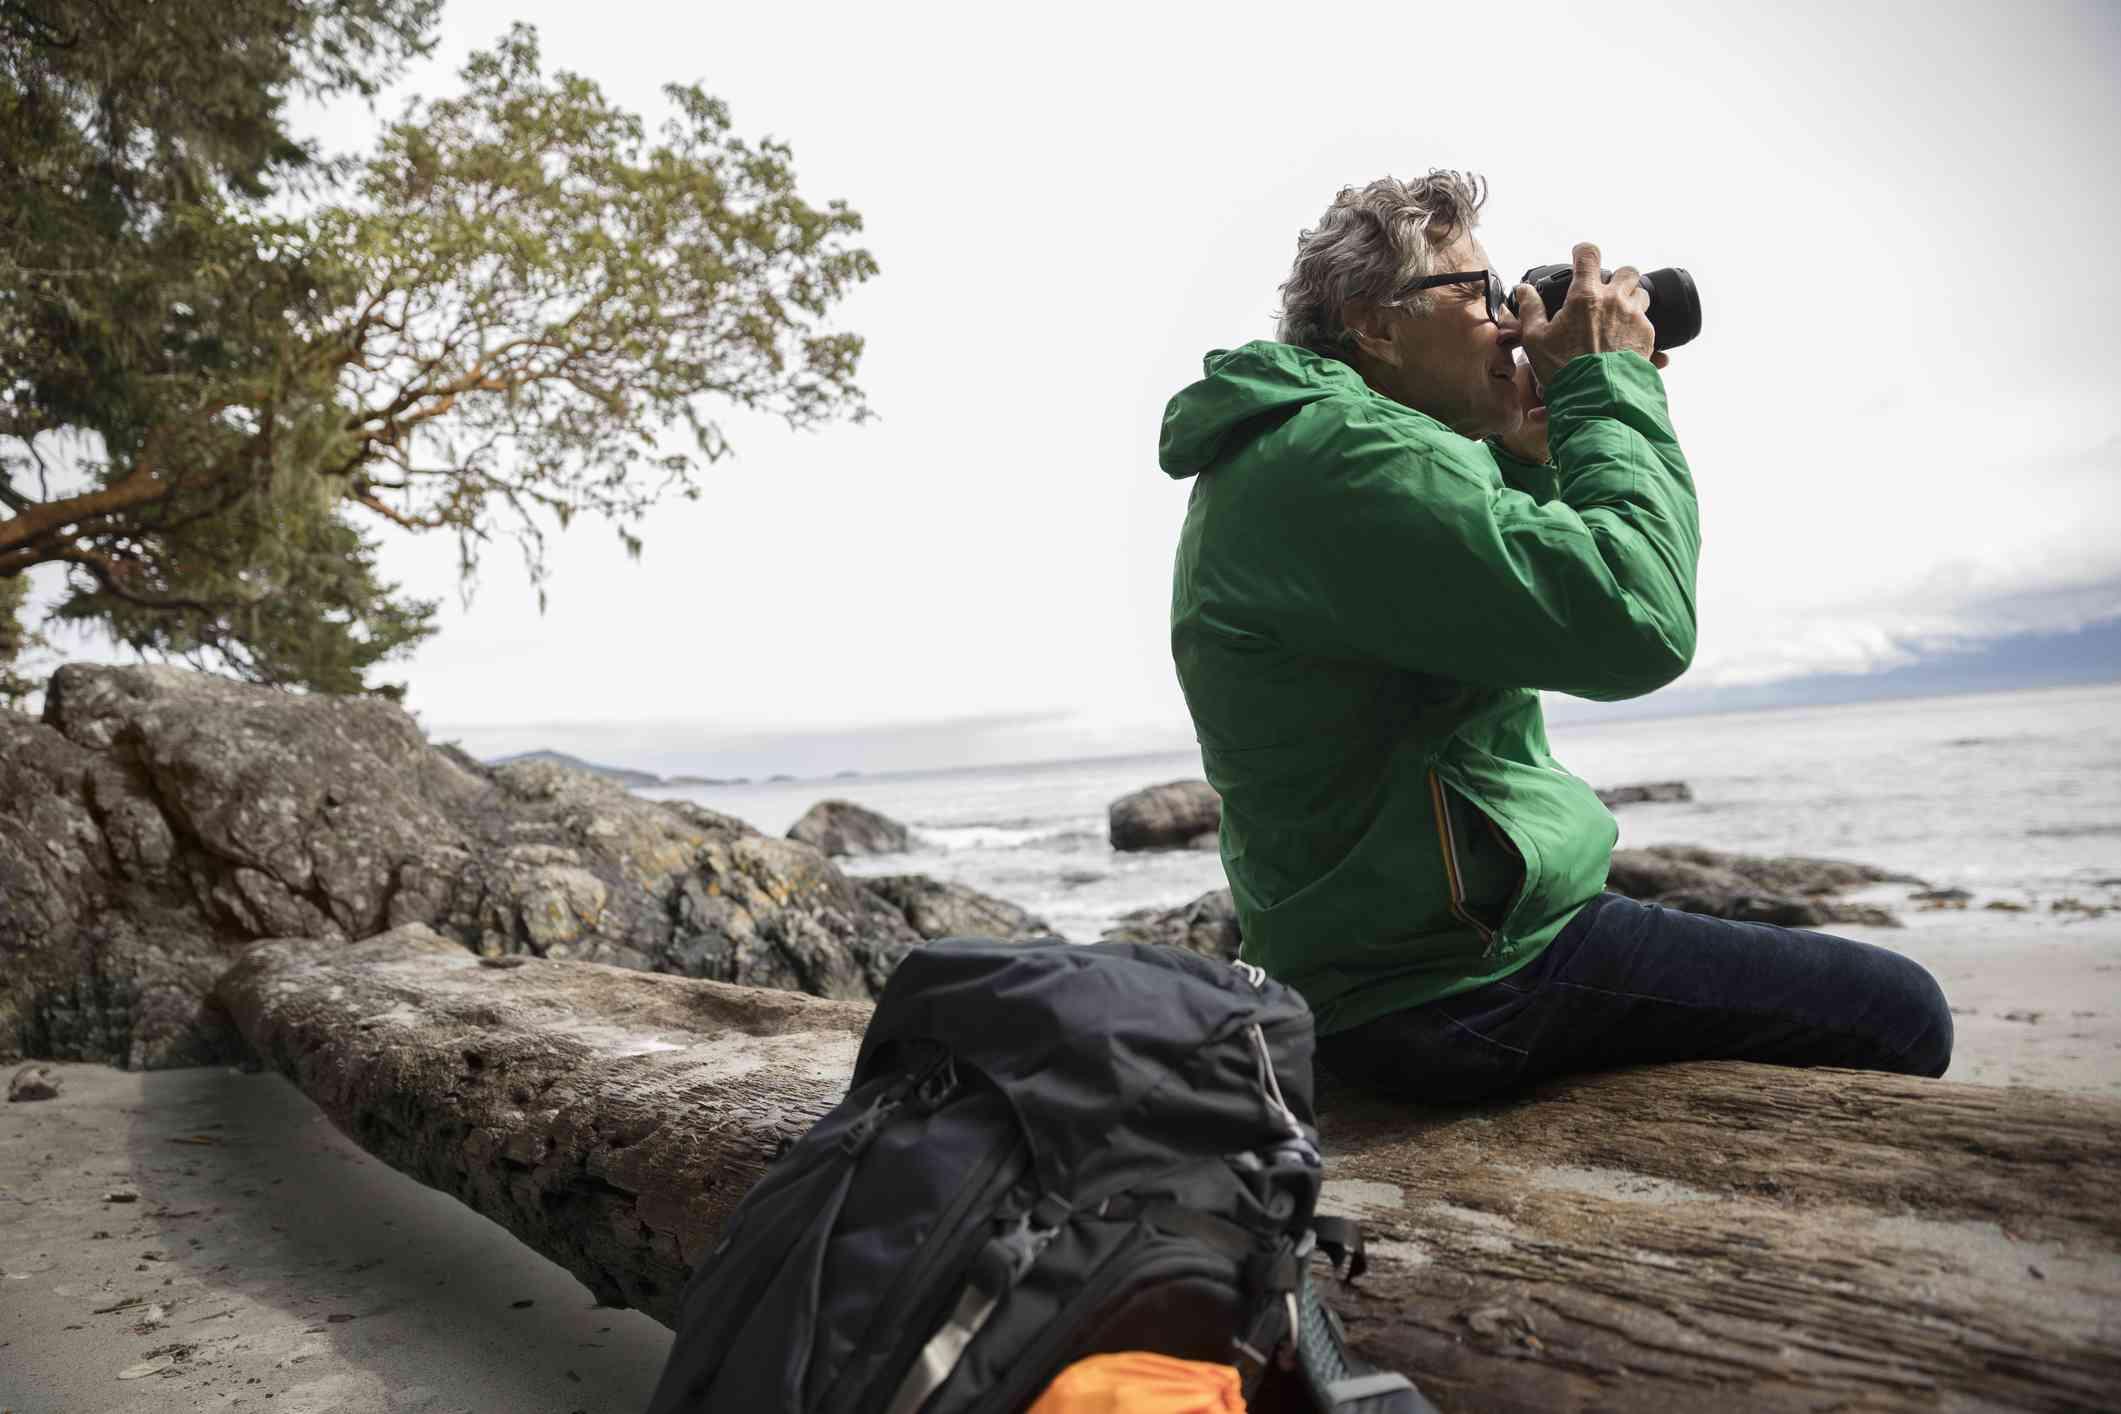 International Landscape Photographer of the Year 2019